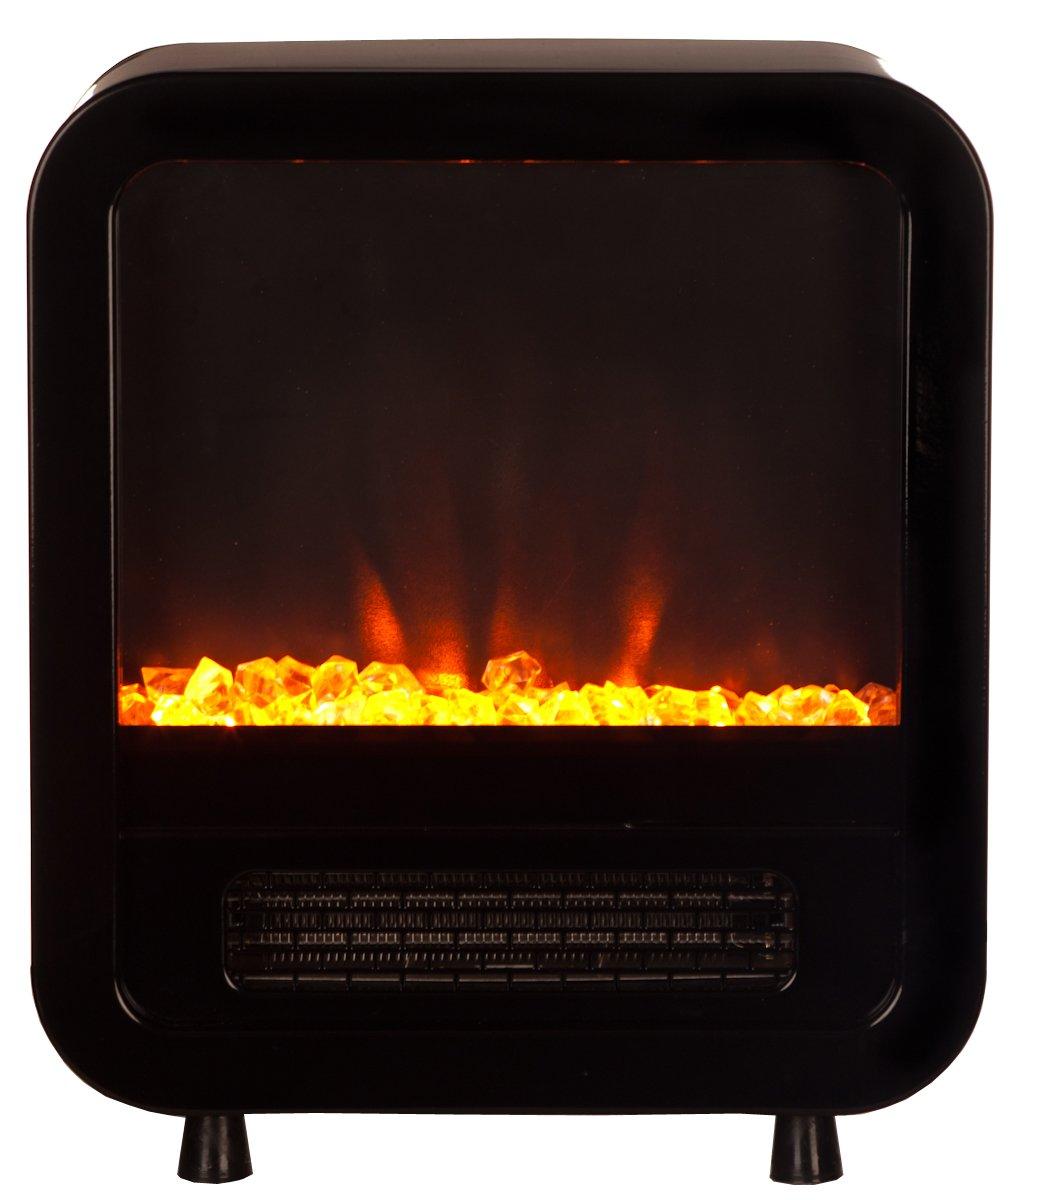 amazon com fire sense 61449 skyline electric fireplace stove